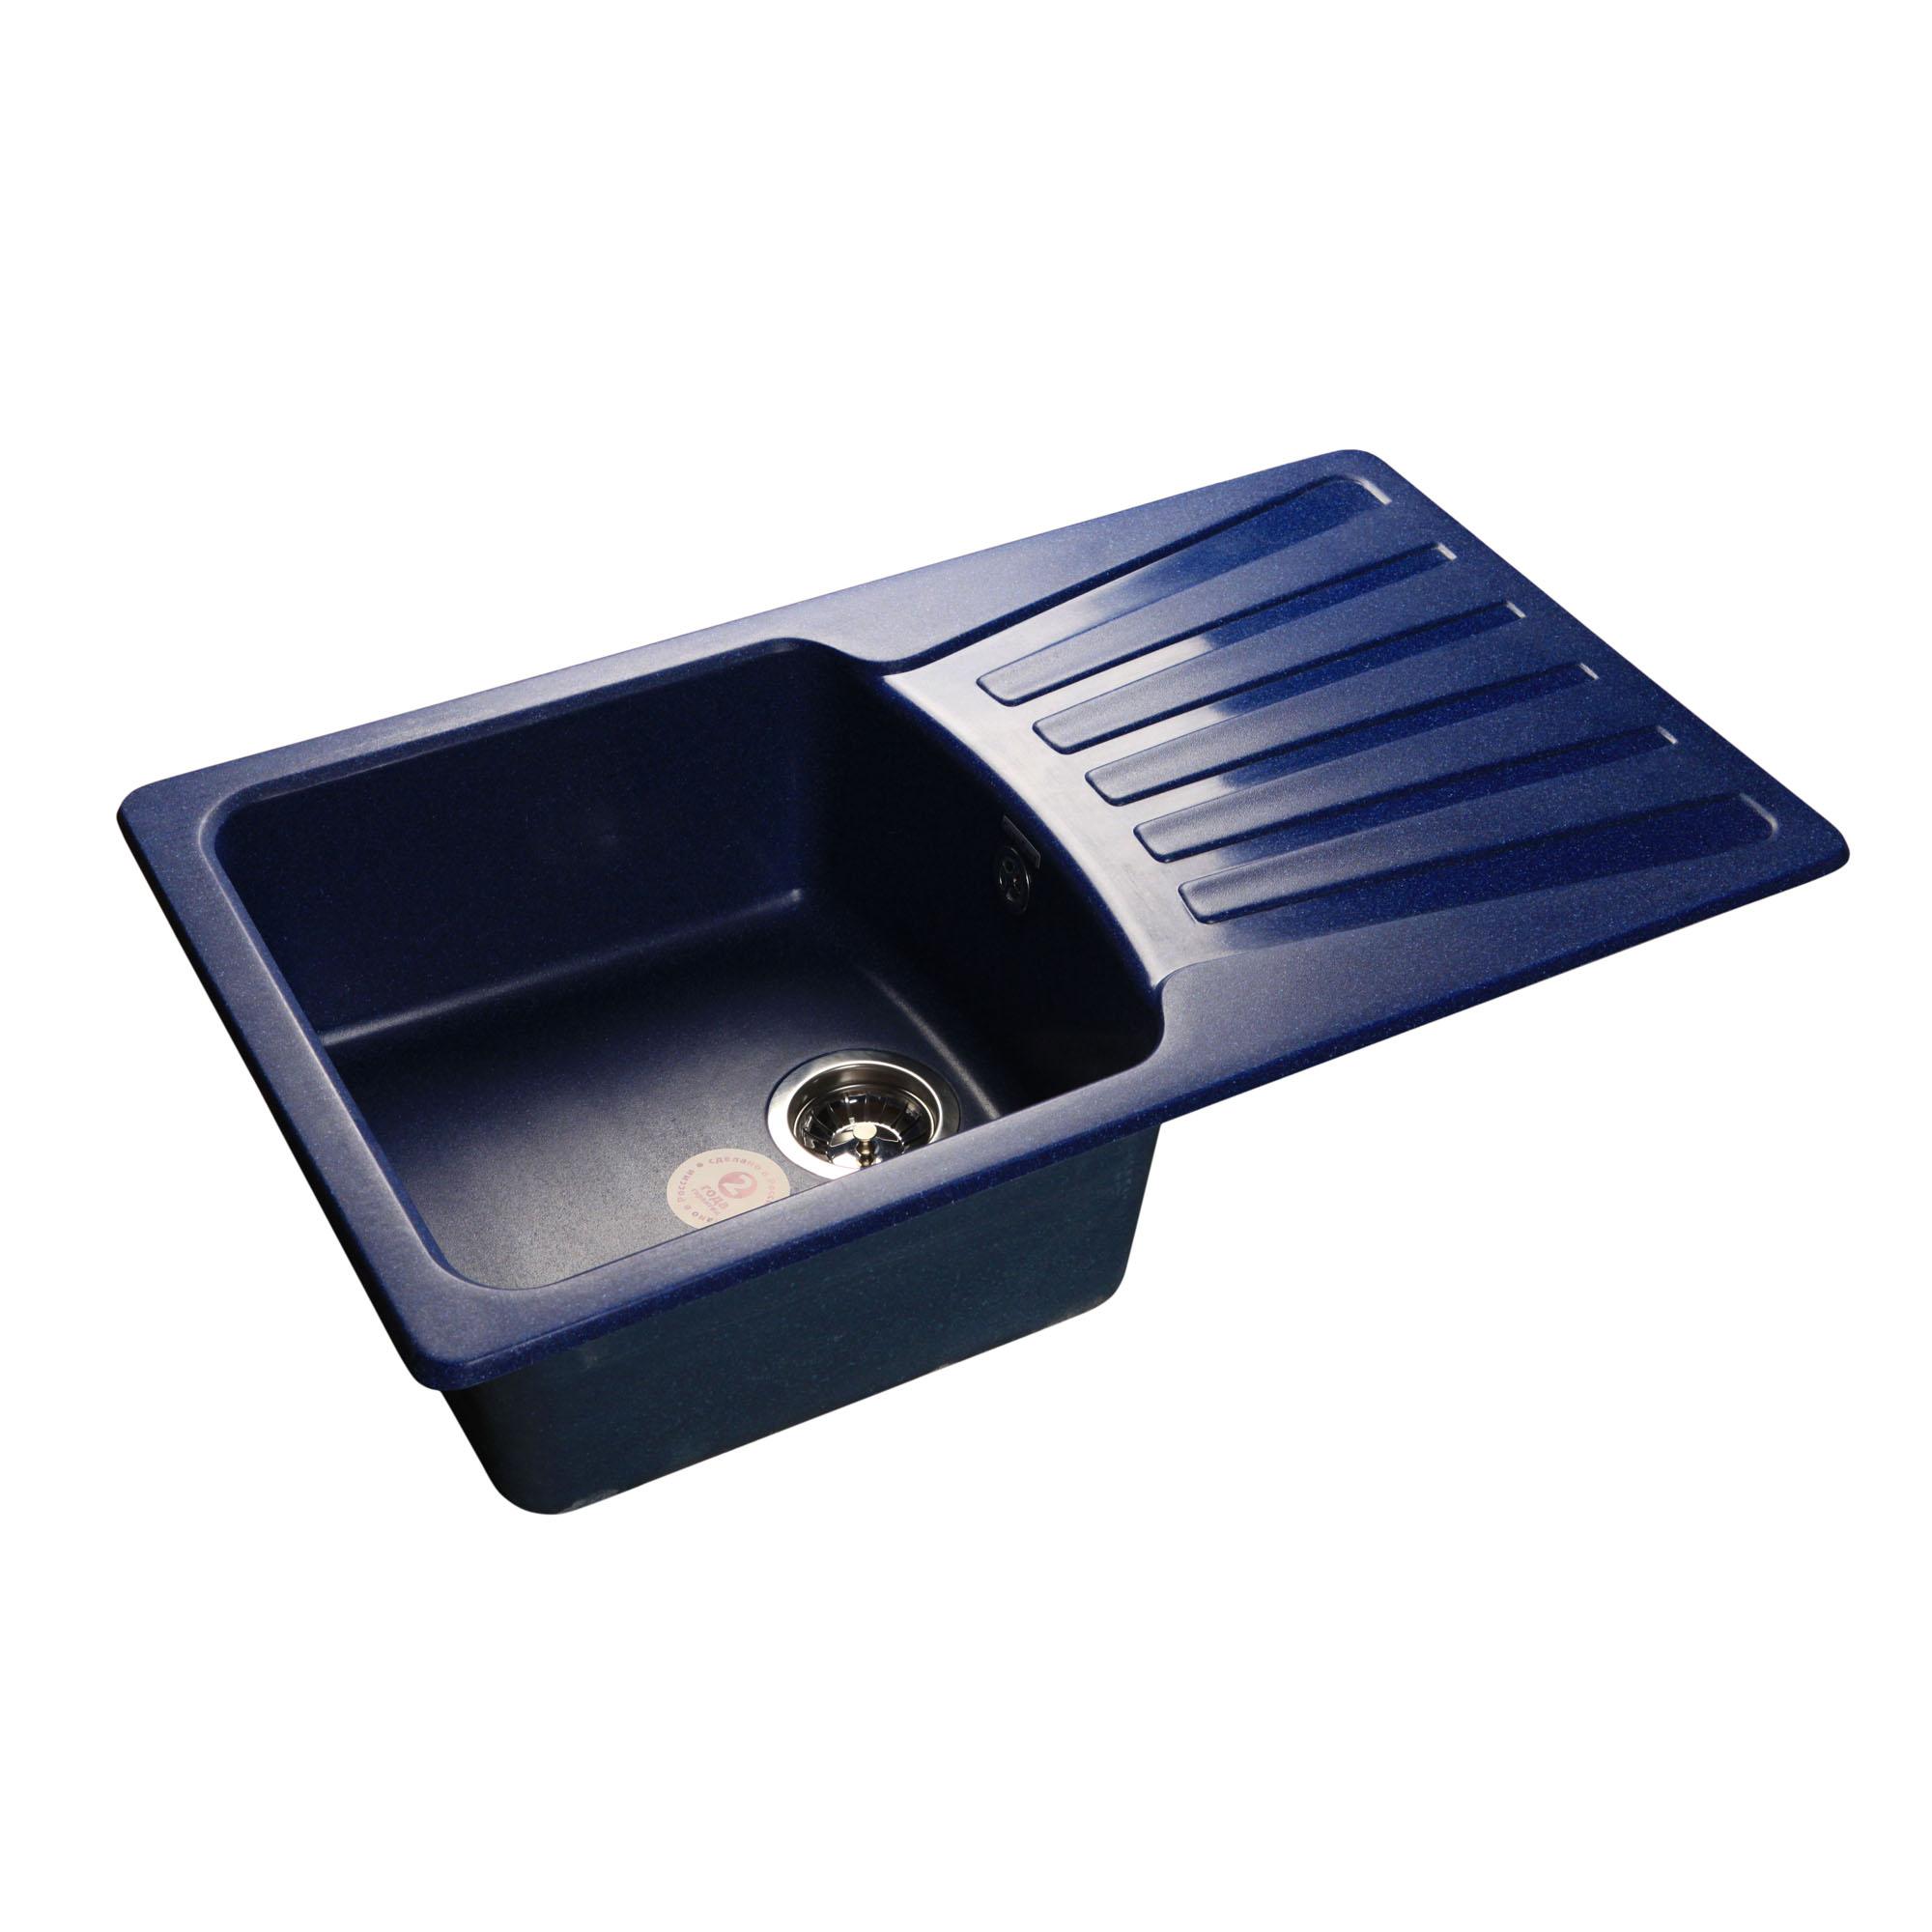 Кухонная мойка GranFest Standart GF-S850L синий атс ip yeastar standart